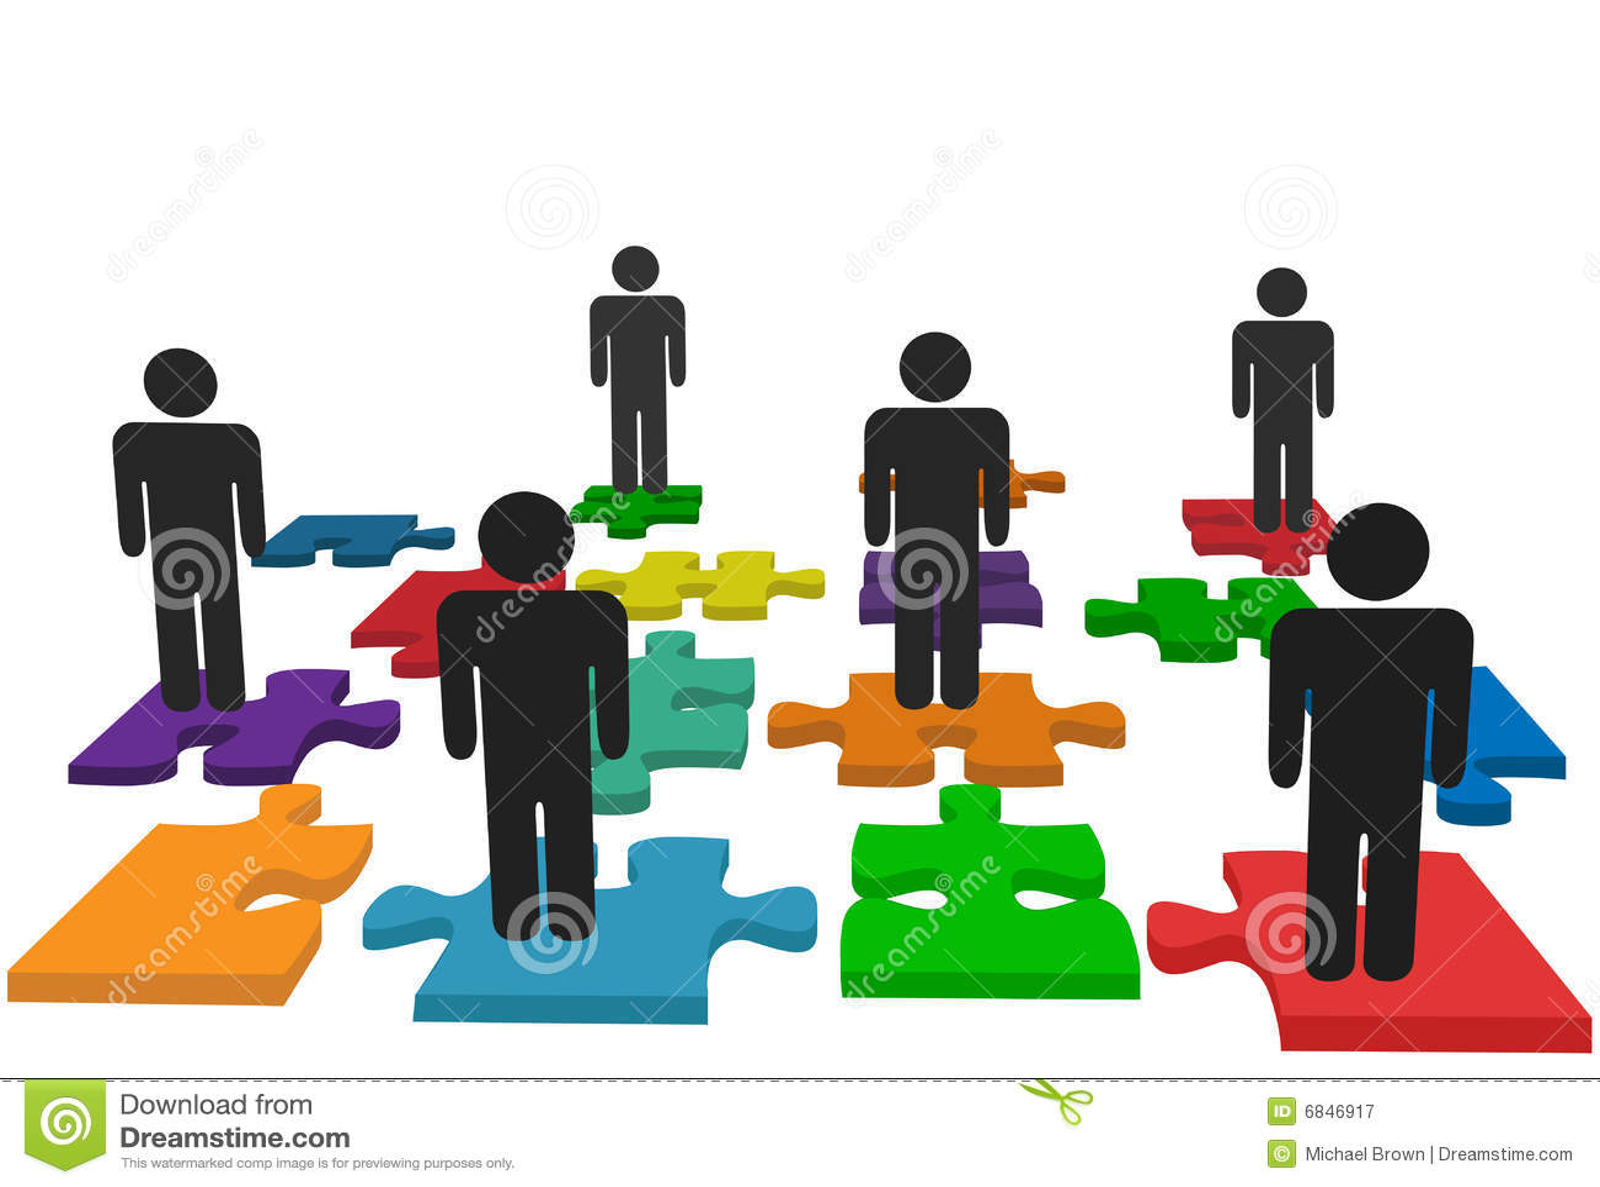 команда символа стойки головоломки частей людей зигзага